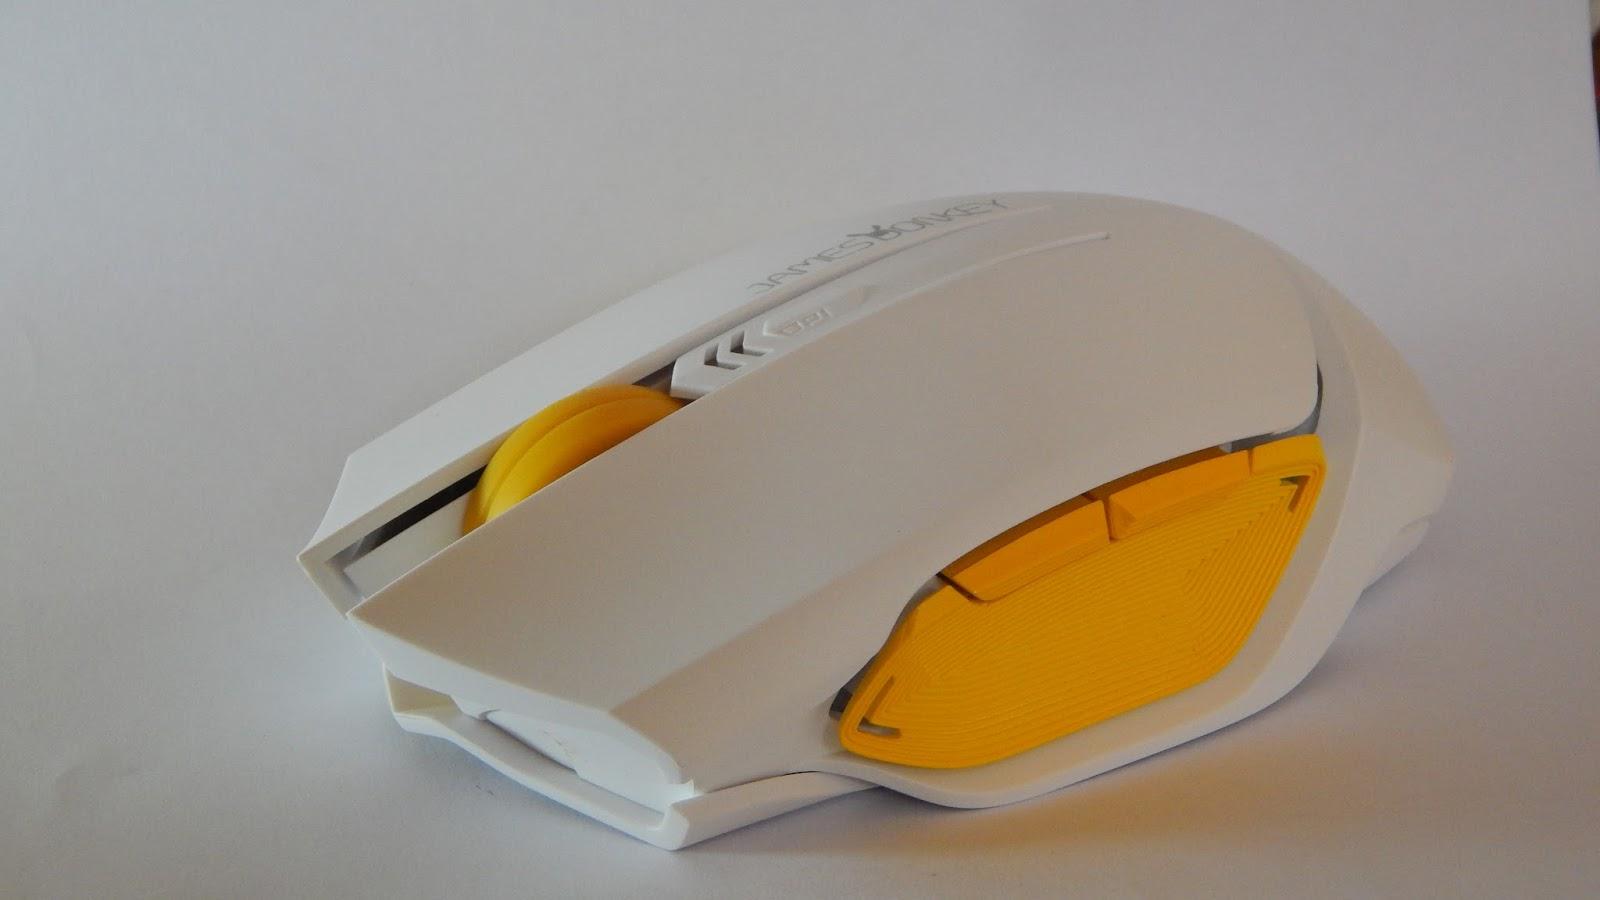 Review Produk Mouse Gaming Vivan James Donkey Izzat Portfolio 102 1600dpi 6d Wireless Optical Black Penampakan Bawah